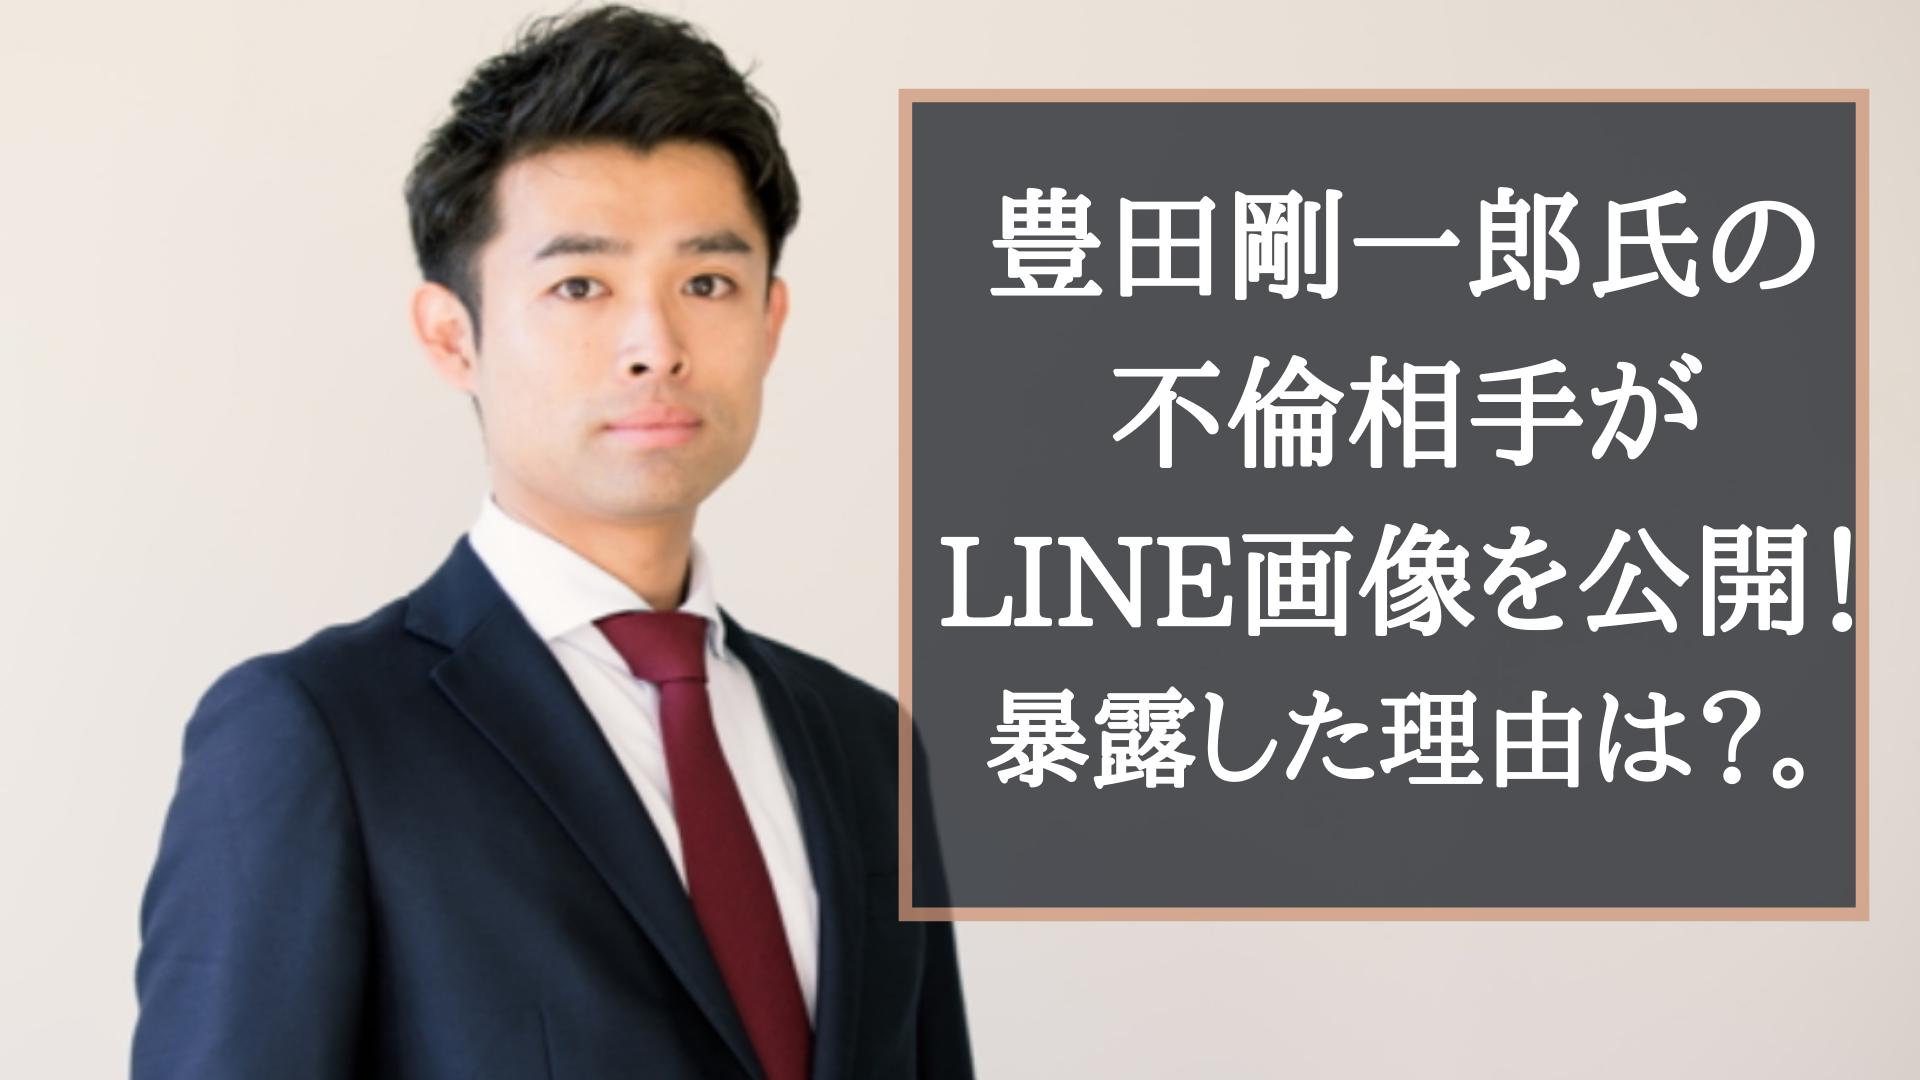 Line 豊田 剛一郎